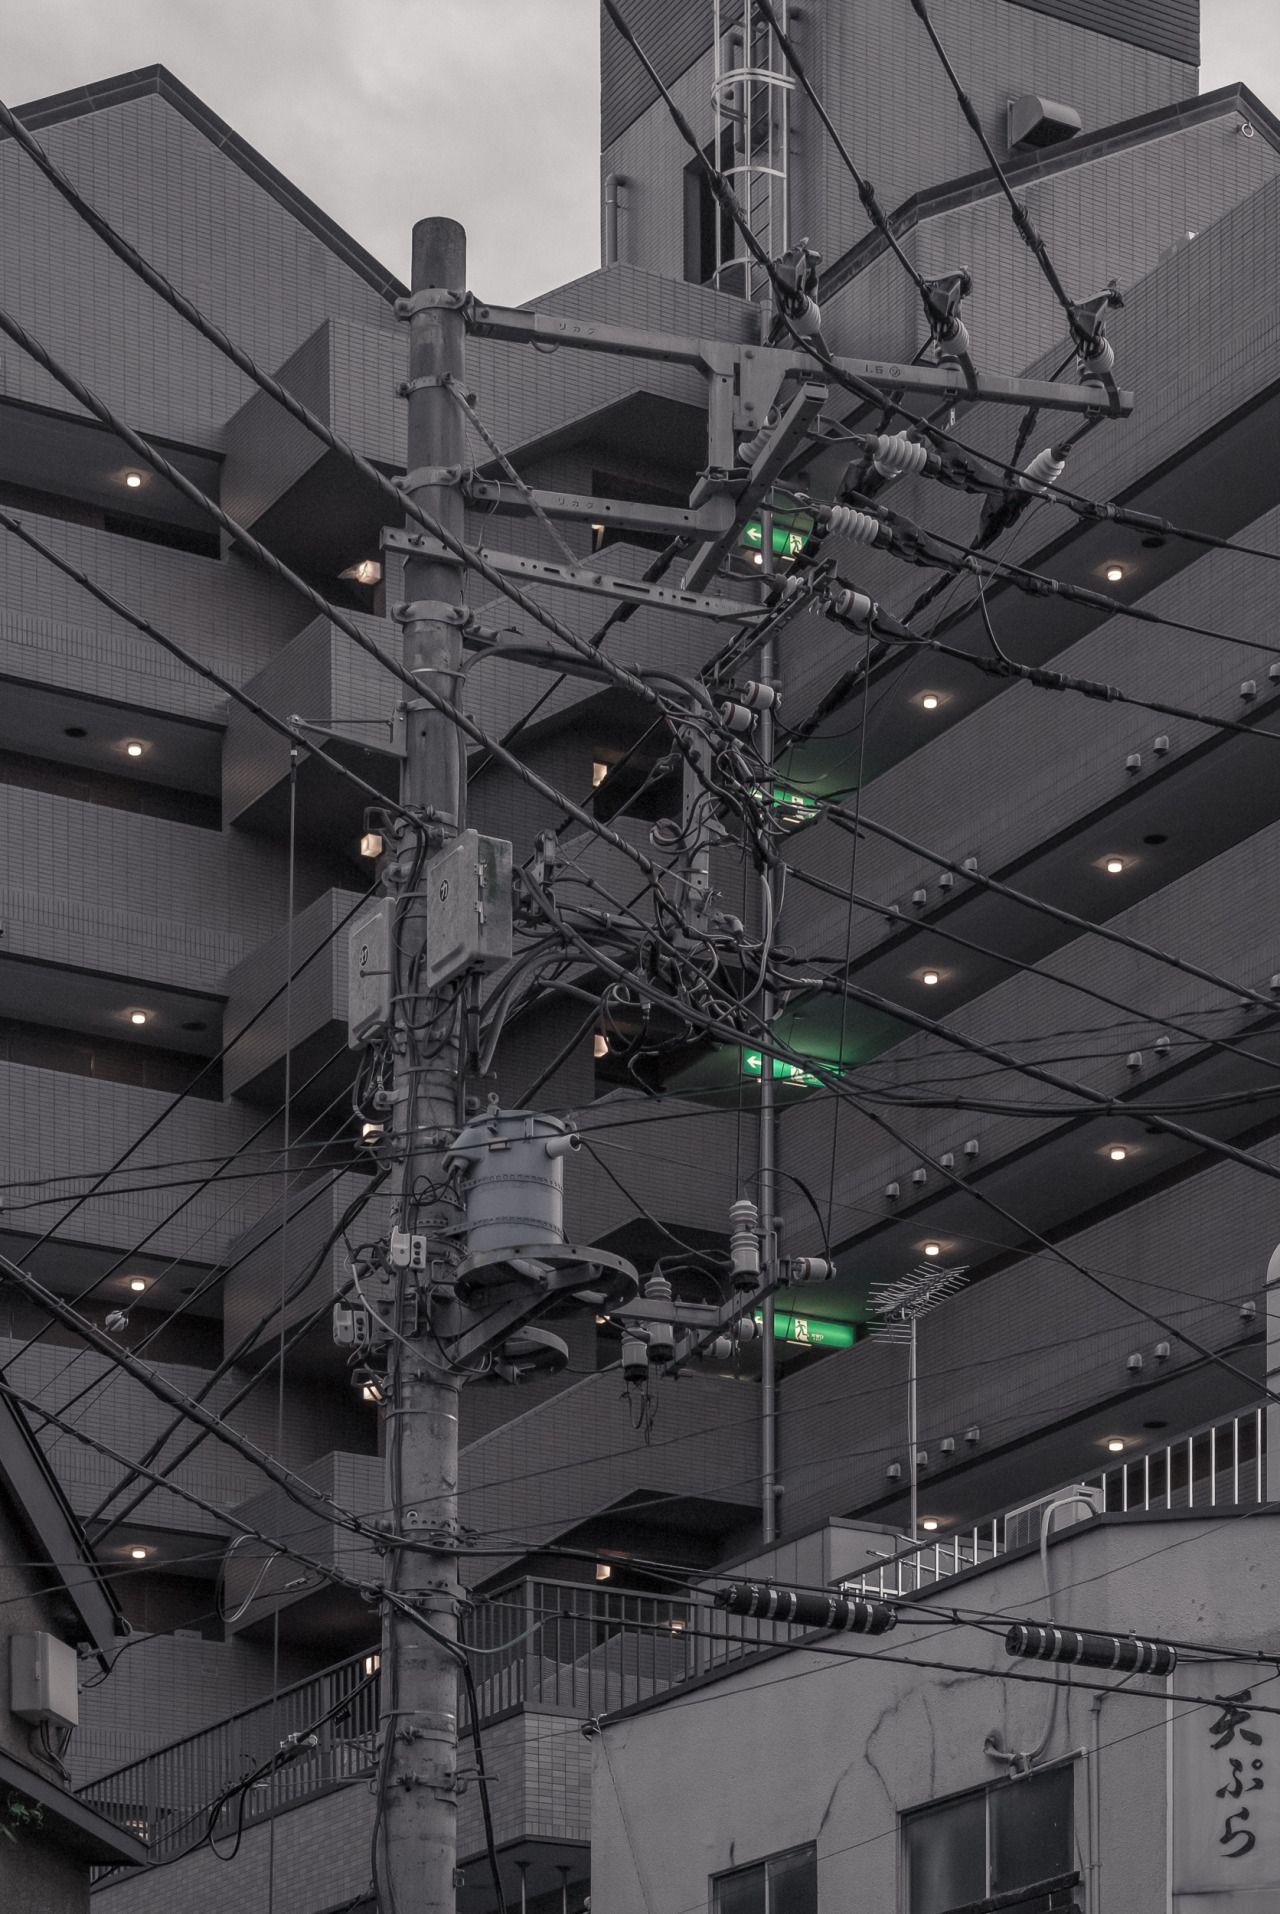 Exits, Sumida-ku, Tokyo | © Jan Vranovský, 2016